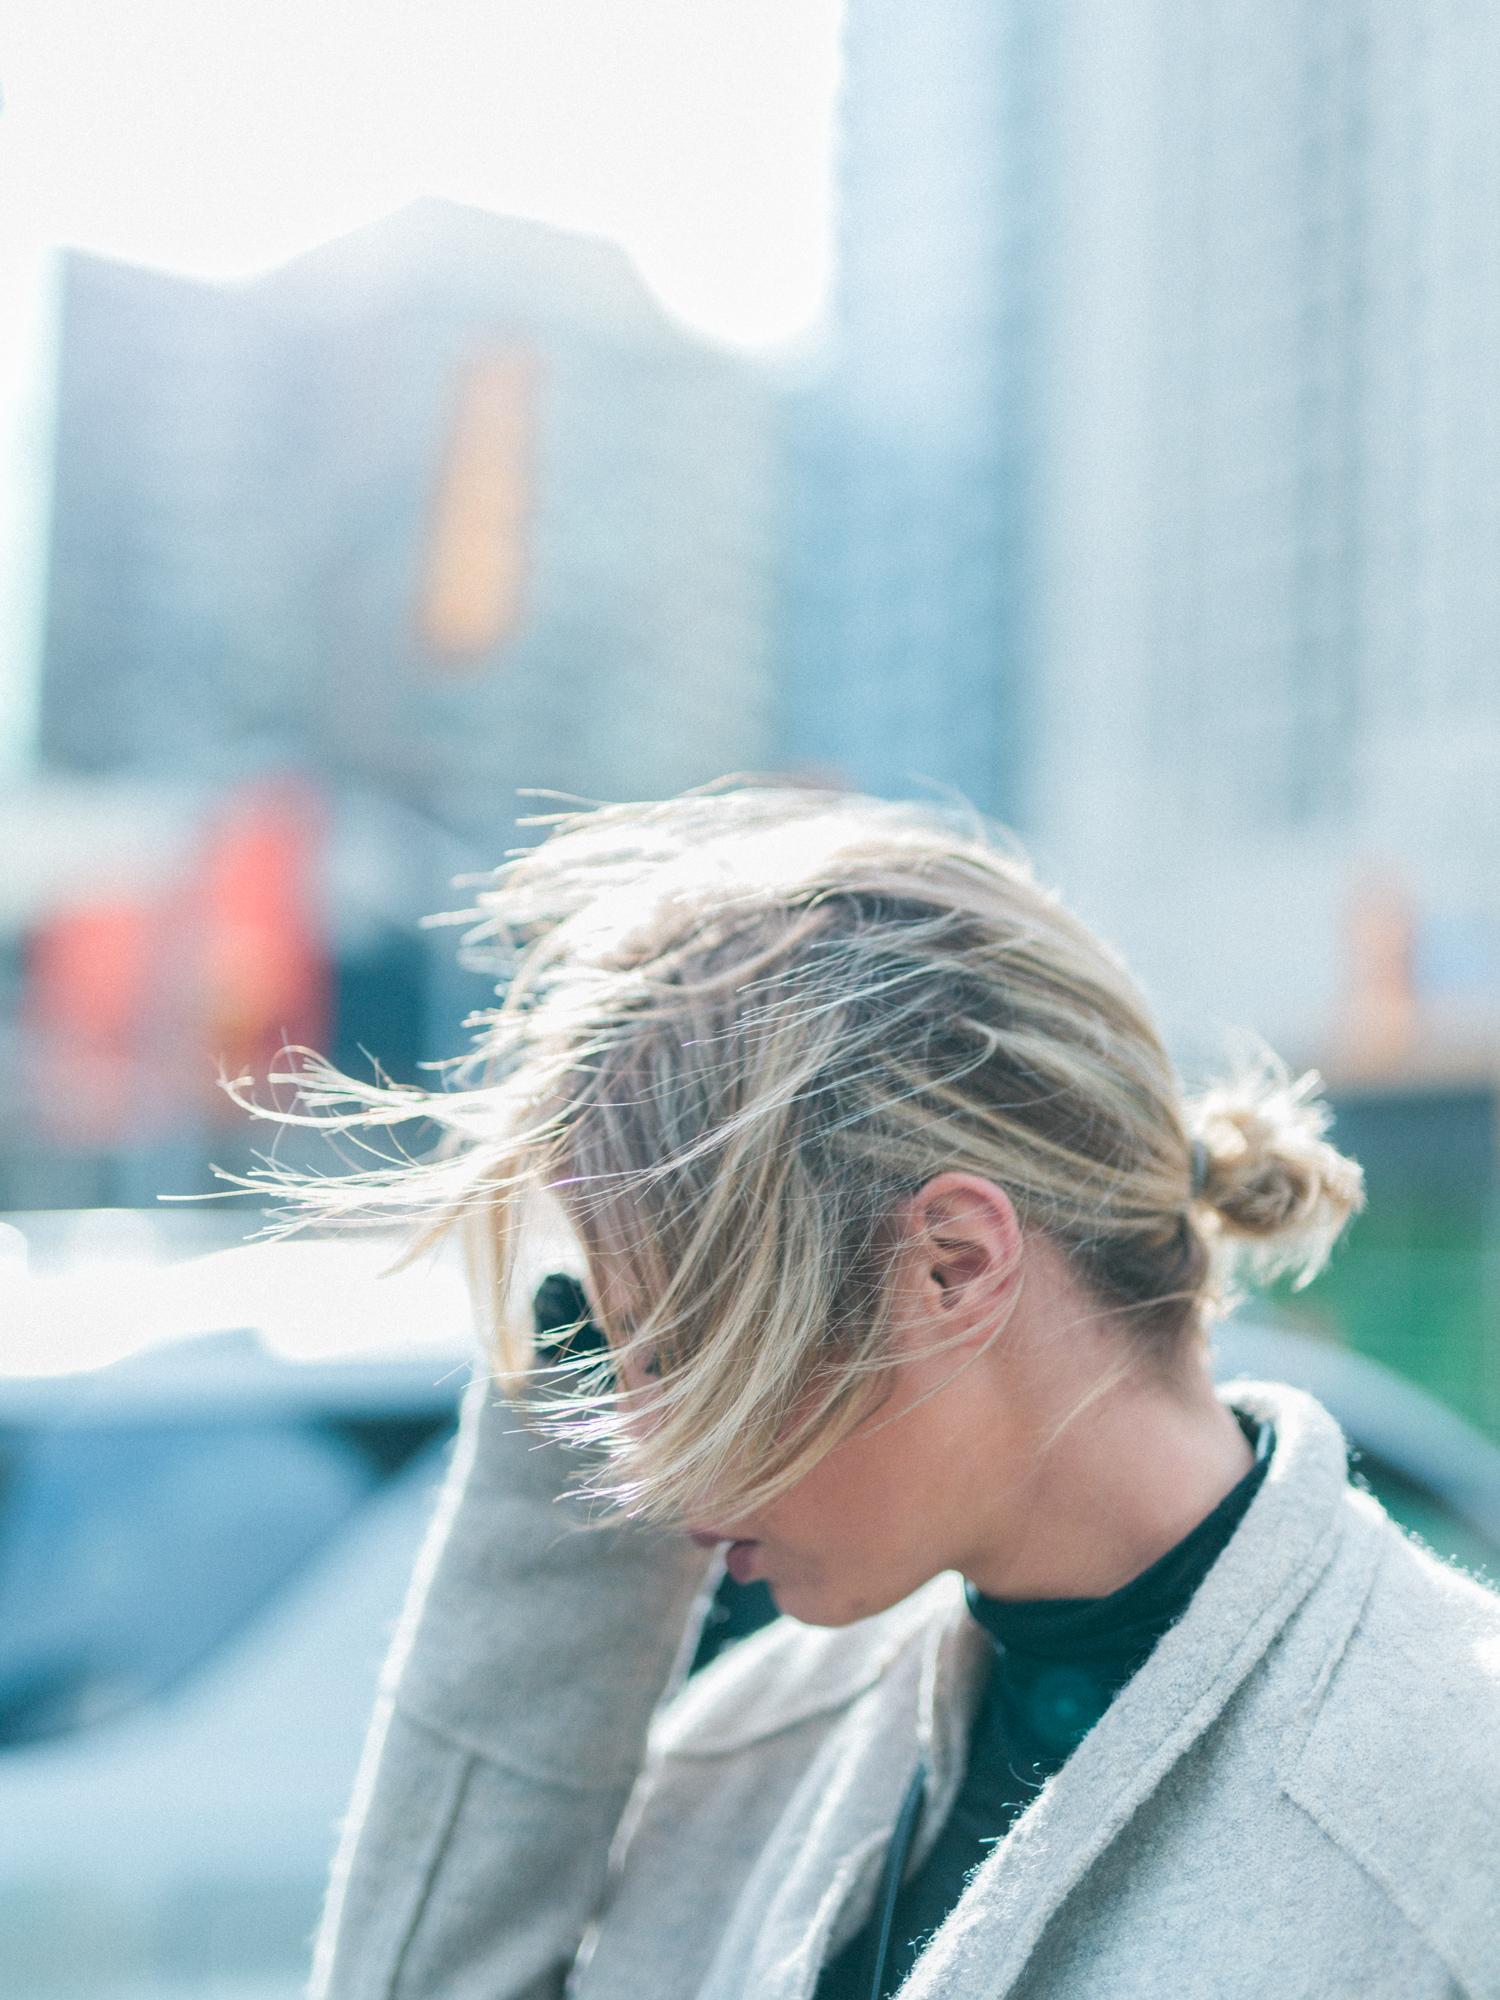 DanielleGirouxPhotography_Toronto_Portrait_StreetPhotography_0C6A1225.jpg